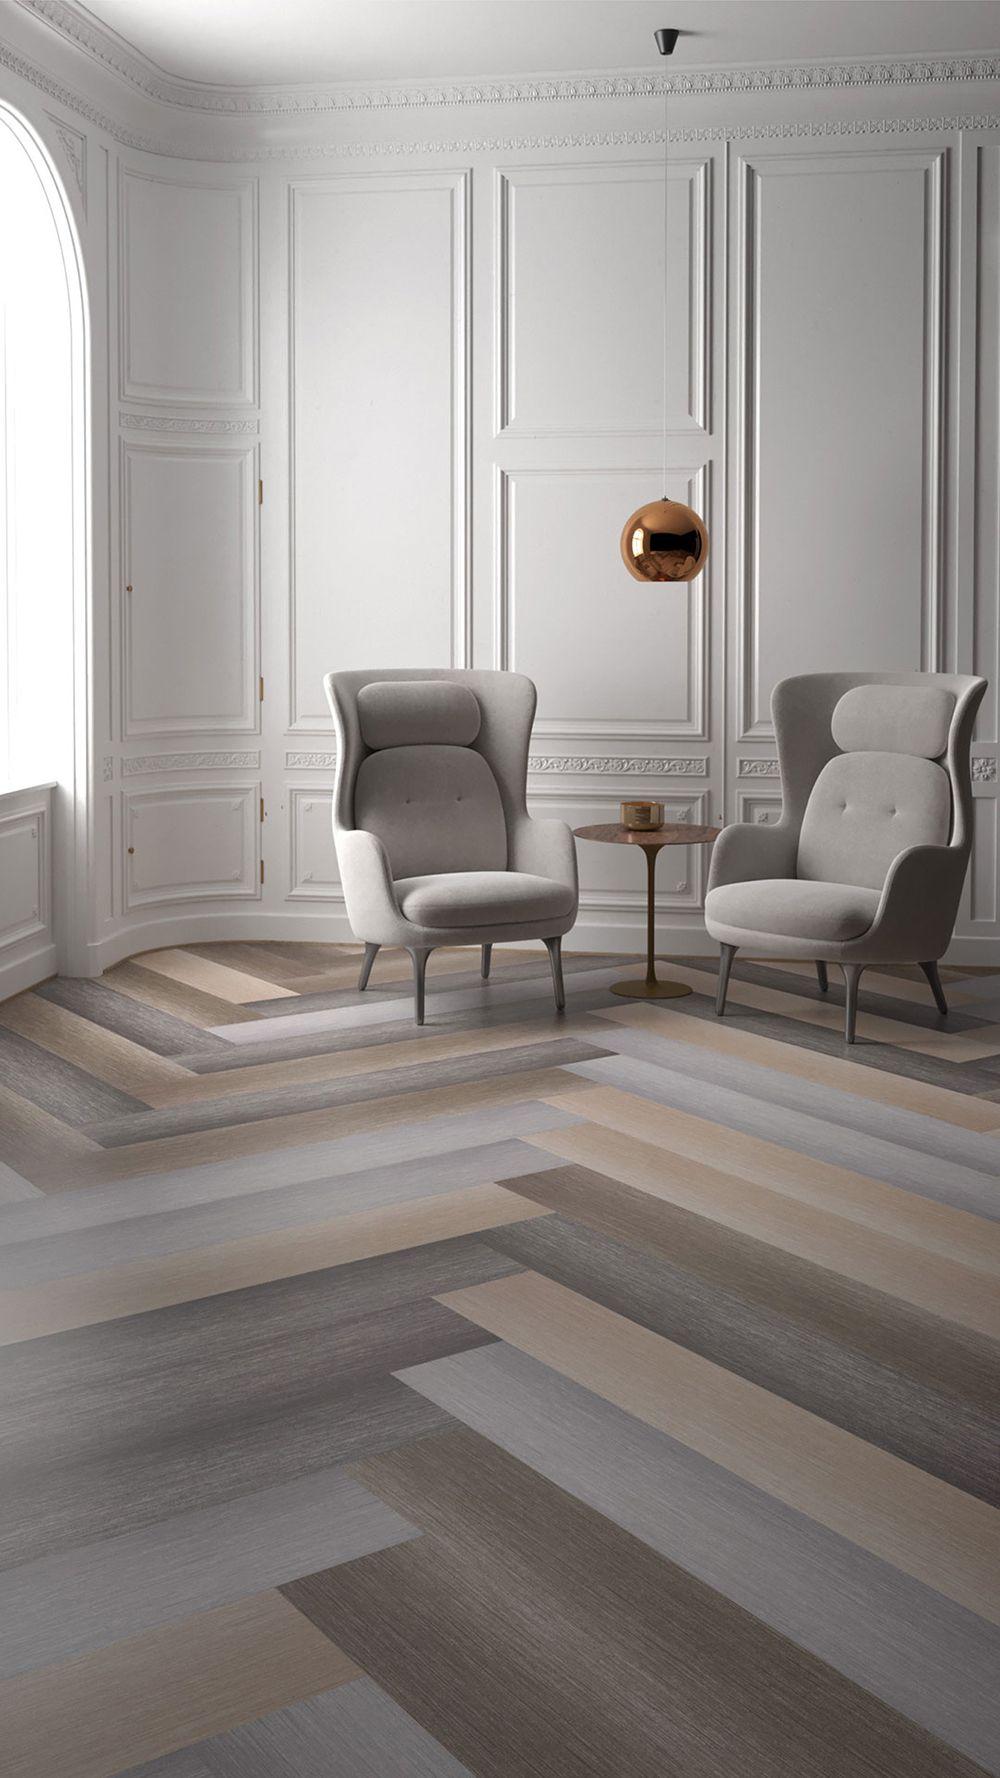 stylist and luxury tile floor designs for living rooms. lineate LVT by Mohawk  Vinyl TilesVinyl FlooringFlooring IdeasMohawk floor Pinterest Mohawks